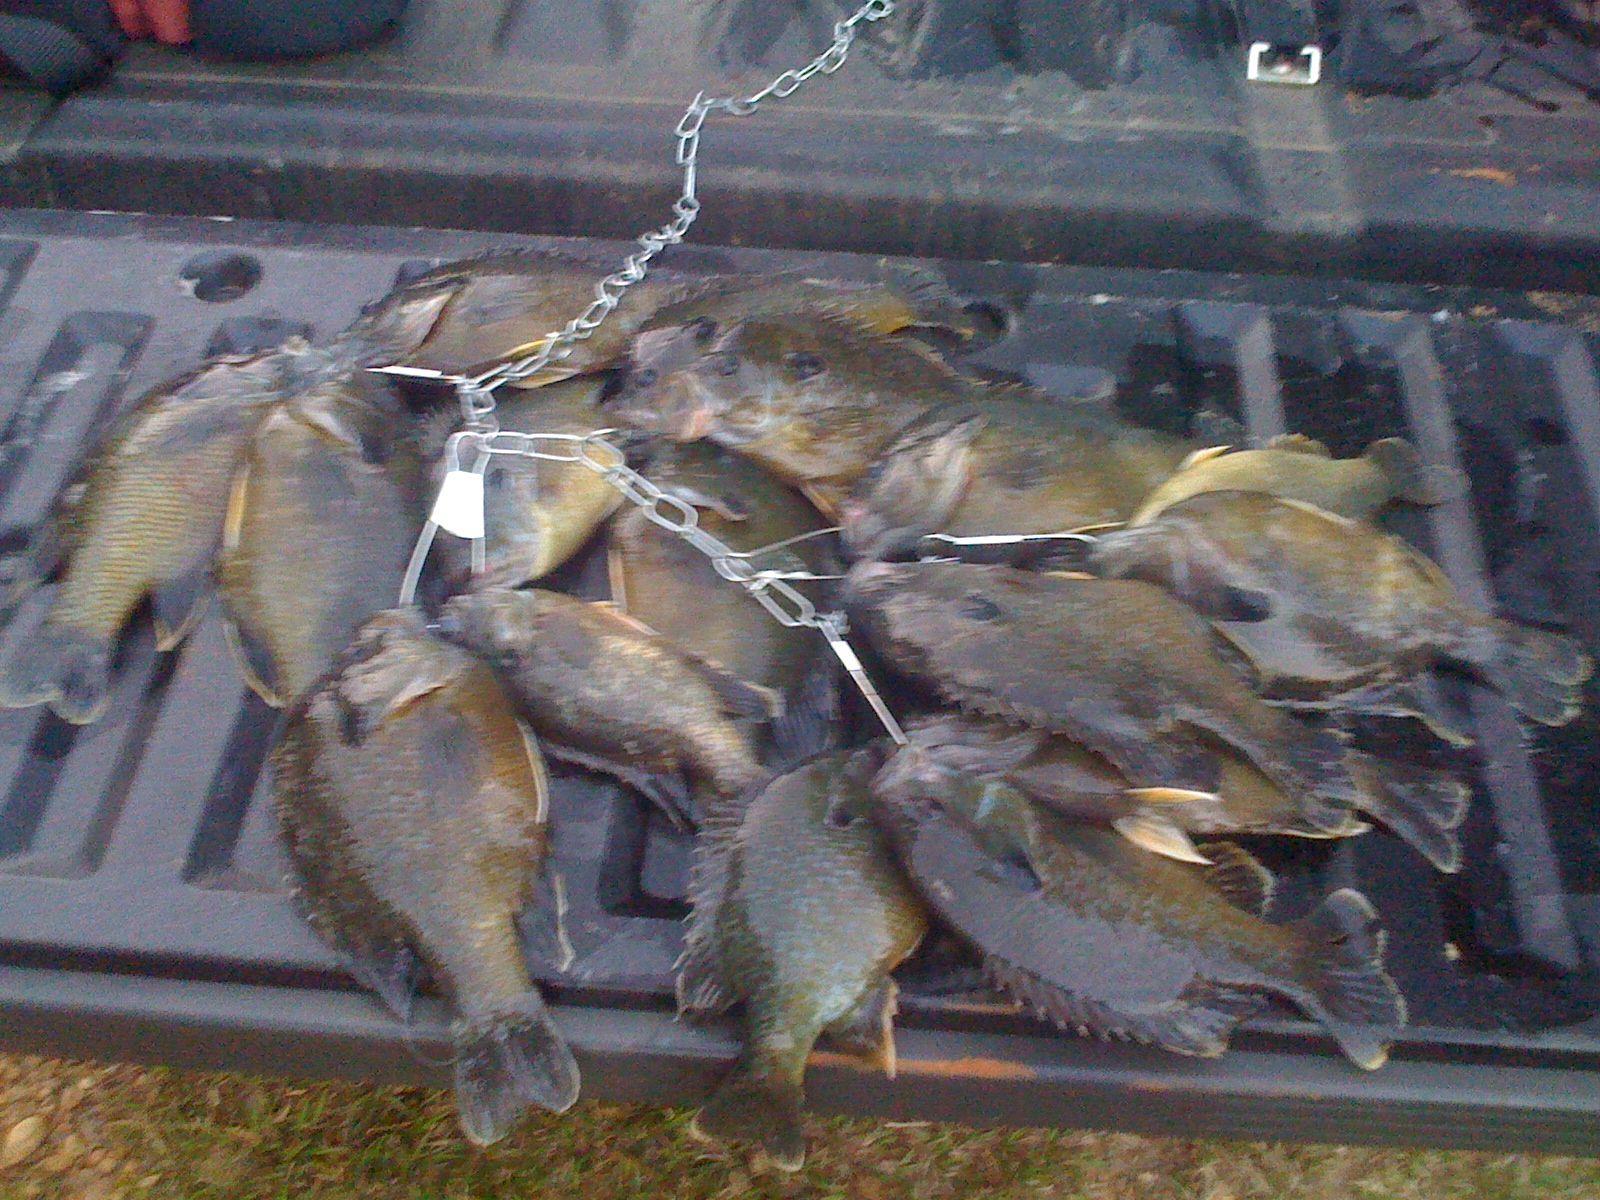 Freshwater fish bream - Fish Pics For Freshwater Bream Fish